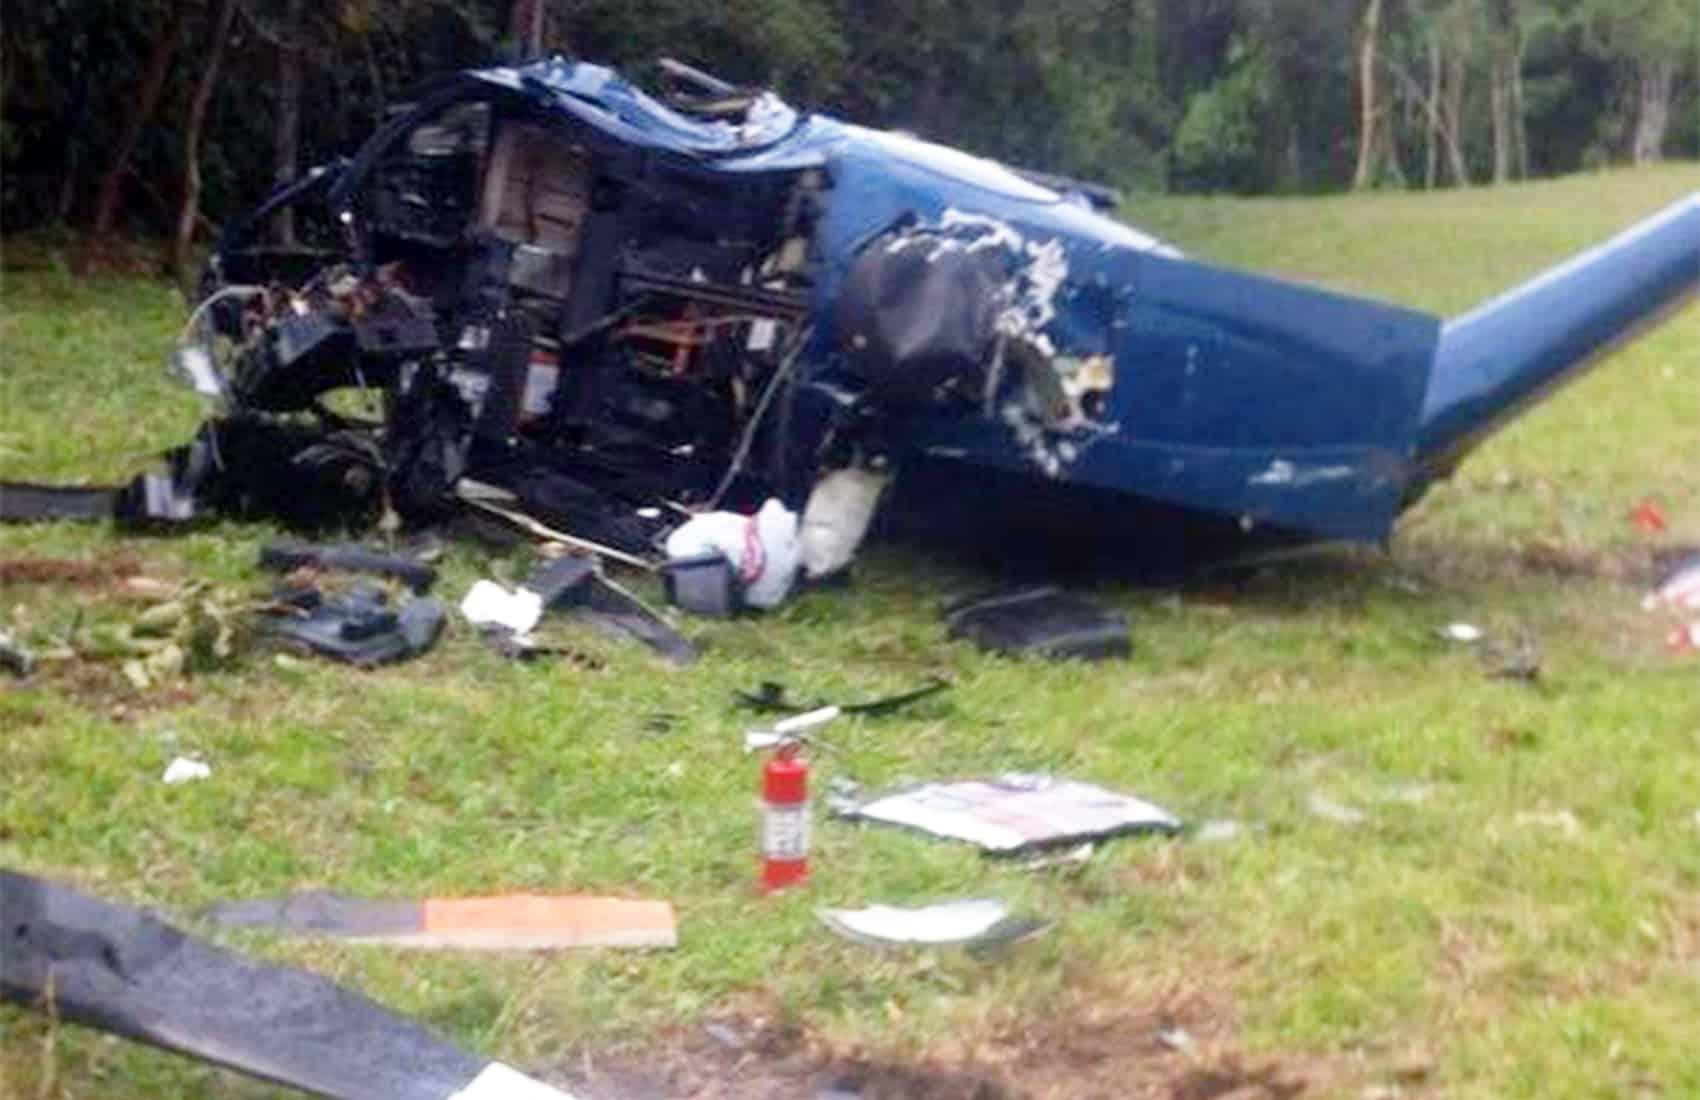 MSP crashed helicopter